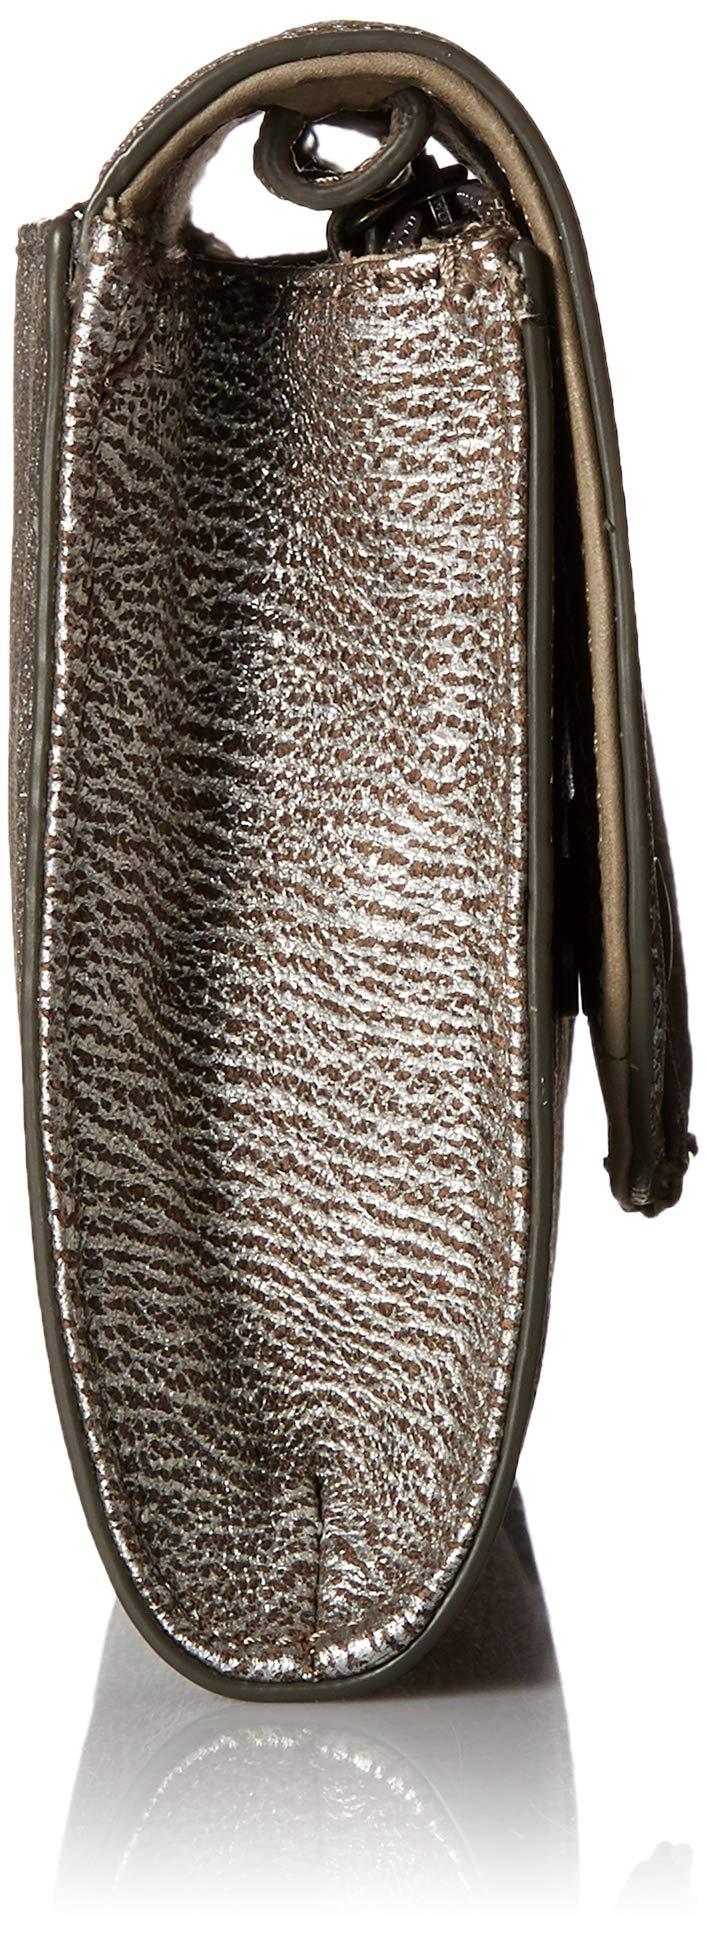 FRYE Melissa Wallet Crossbody Clutch Leather Bag, silver by FRYE (Image #3)